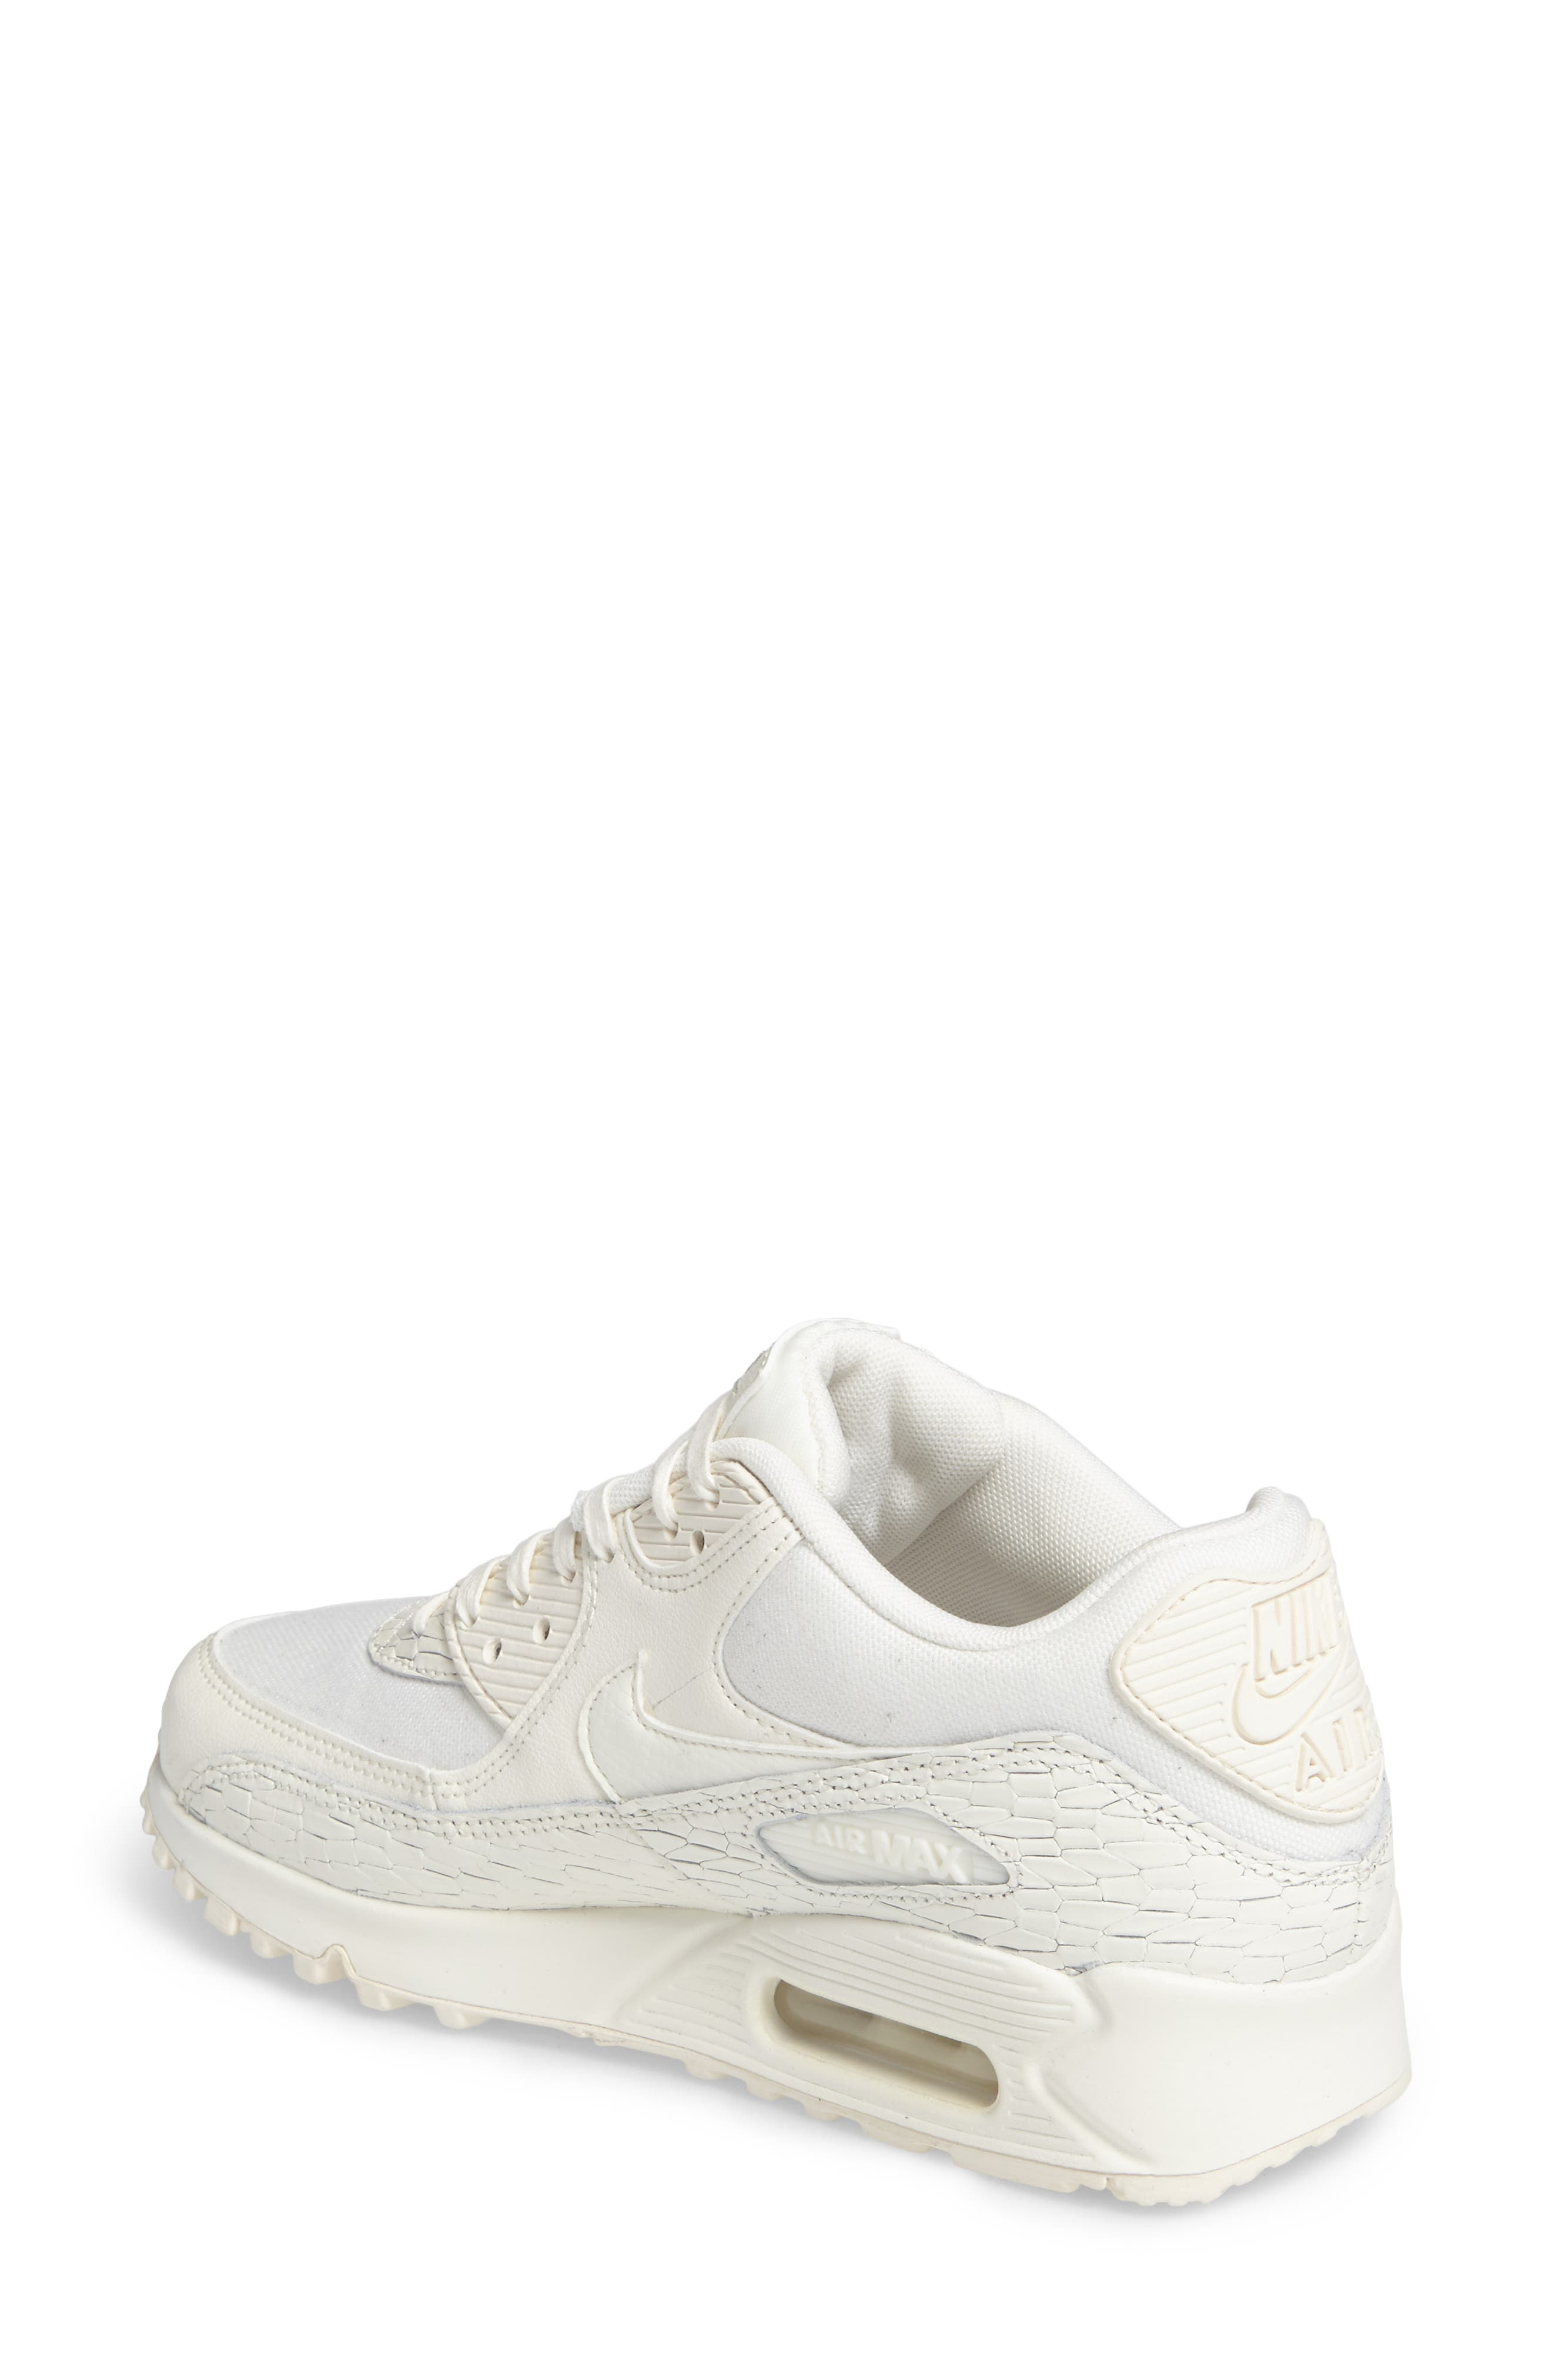 Air Max 90 Premium Leather Sneaker,                             Alternate thumbnail 2, color,                             250